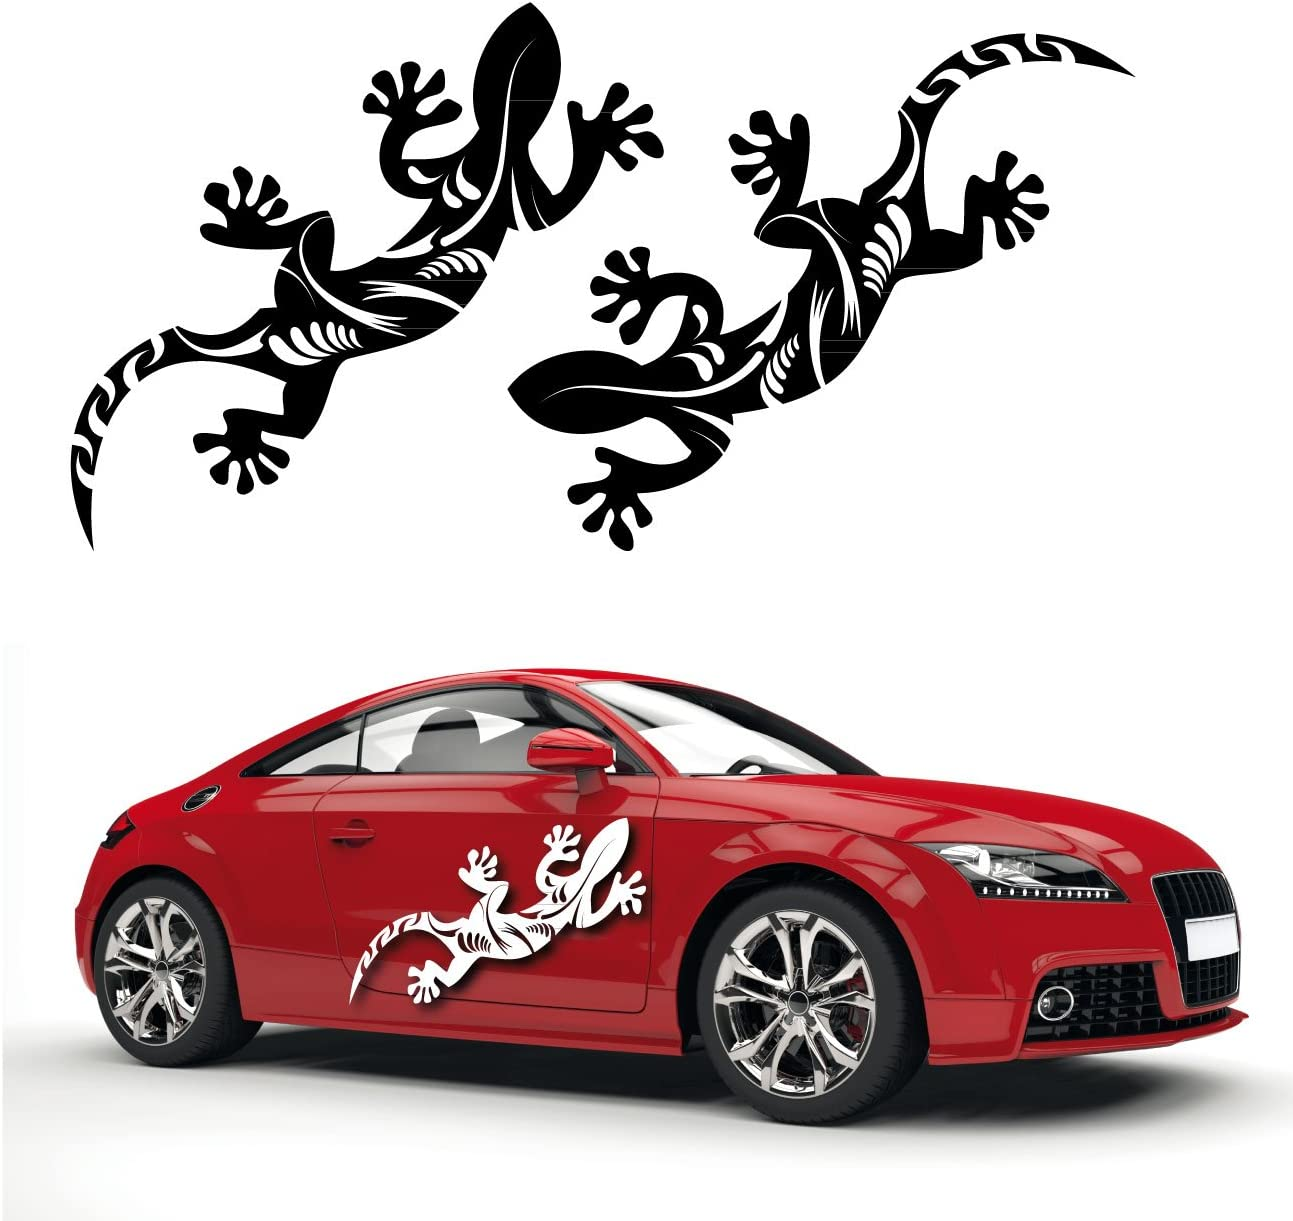 2er Set Gecko Autoaufkleber Aufkleber Geko Gekko Auto Sticker Hibiskus Tattoo Motiv Kb268 Auto